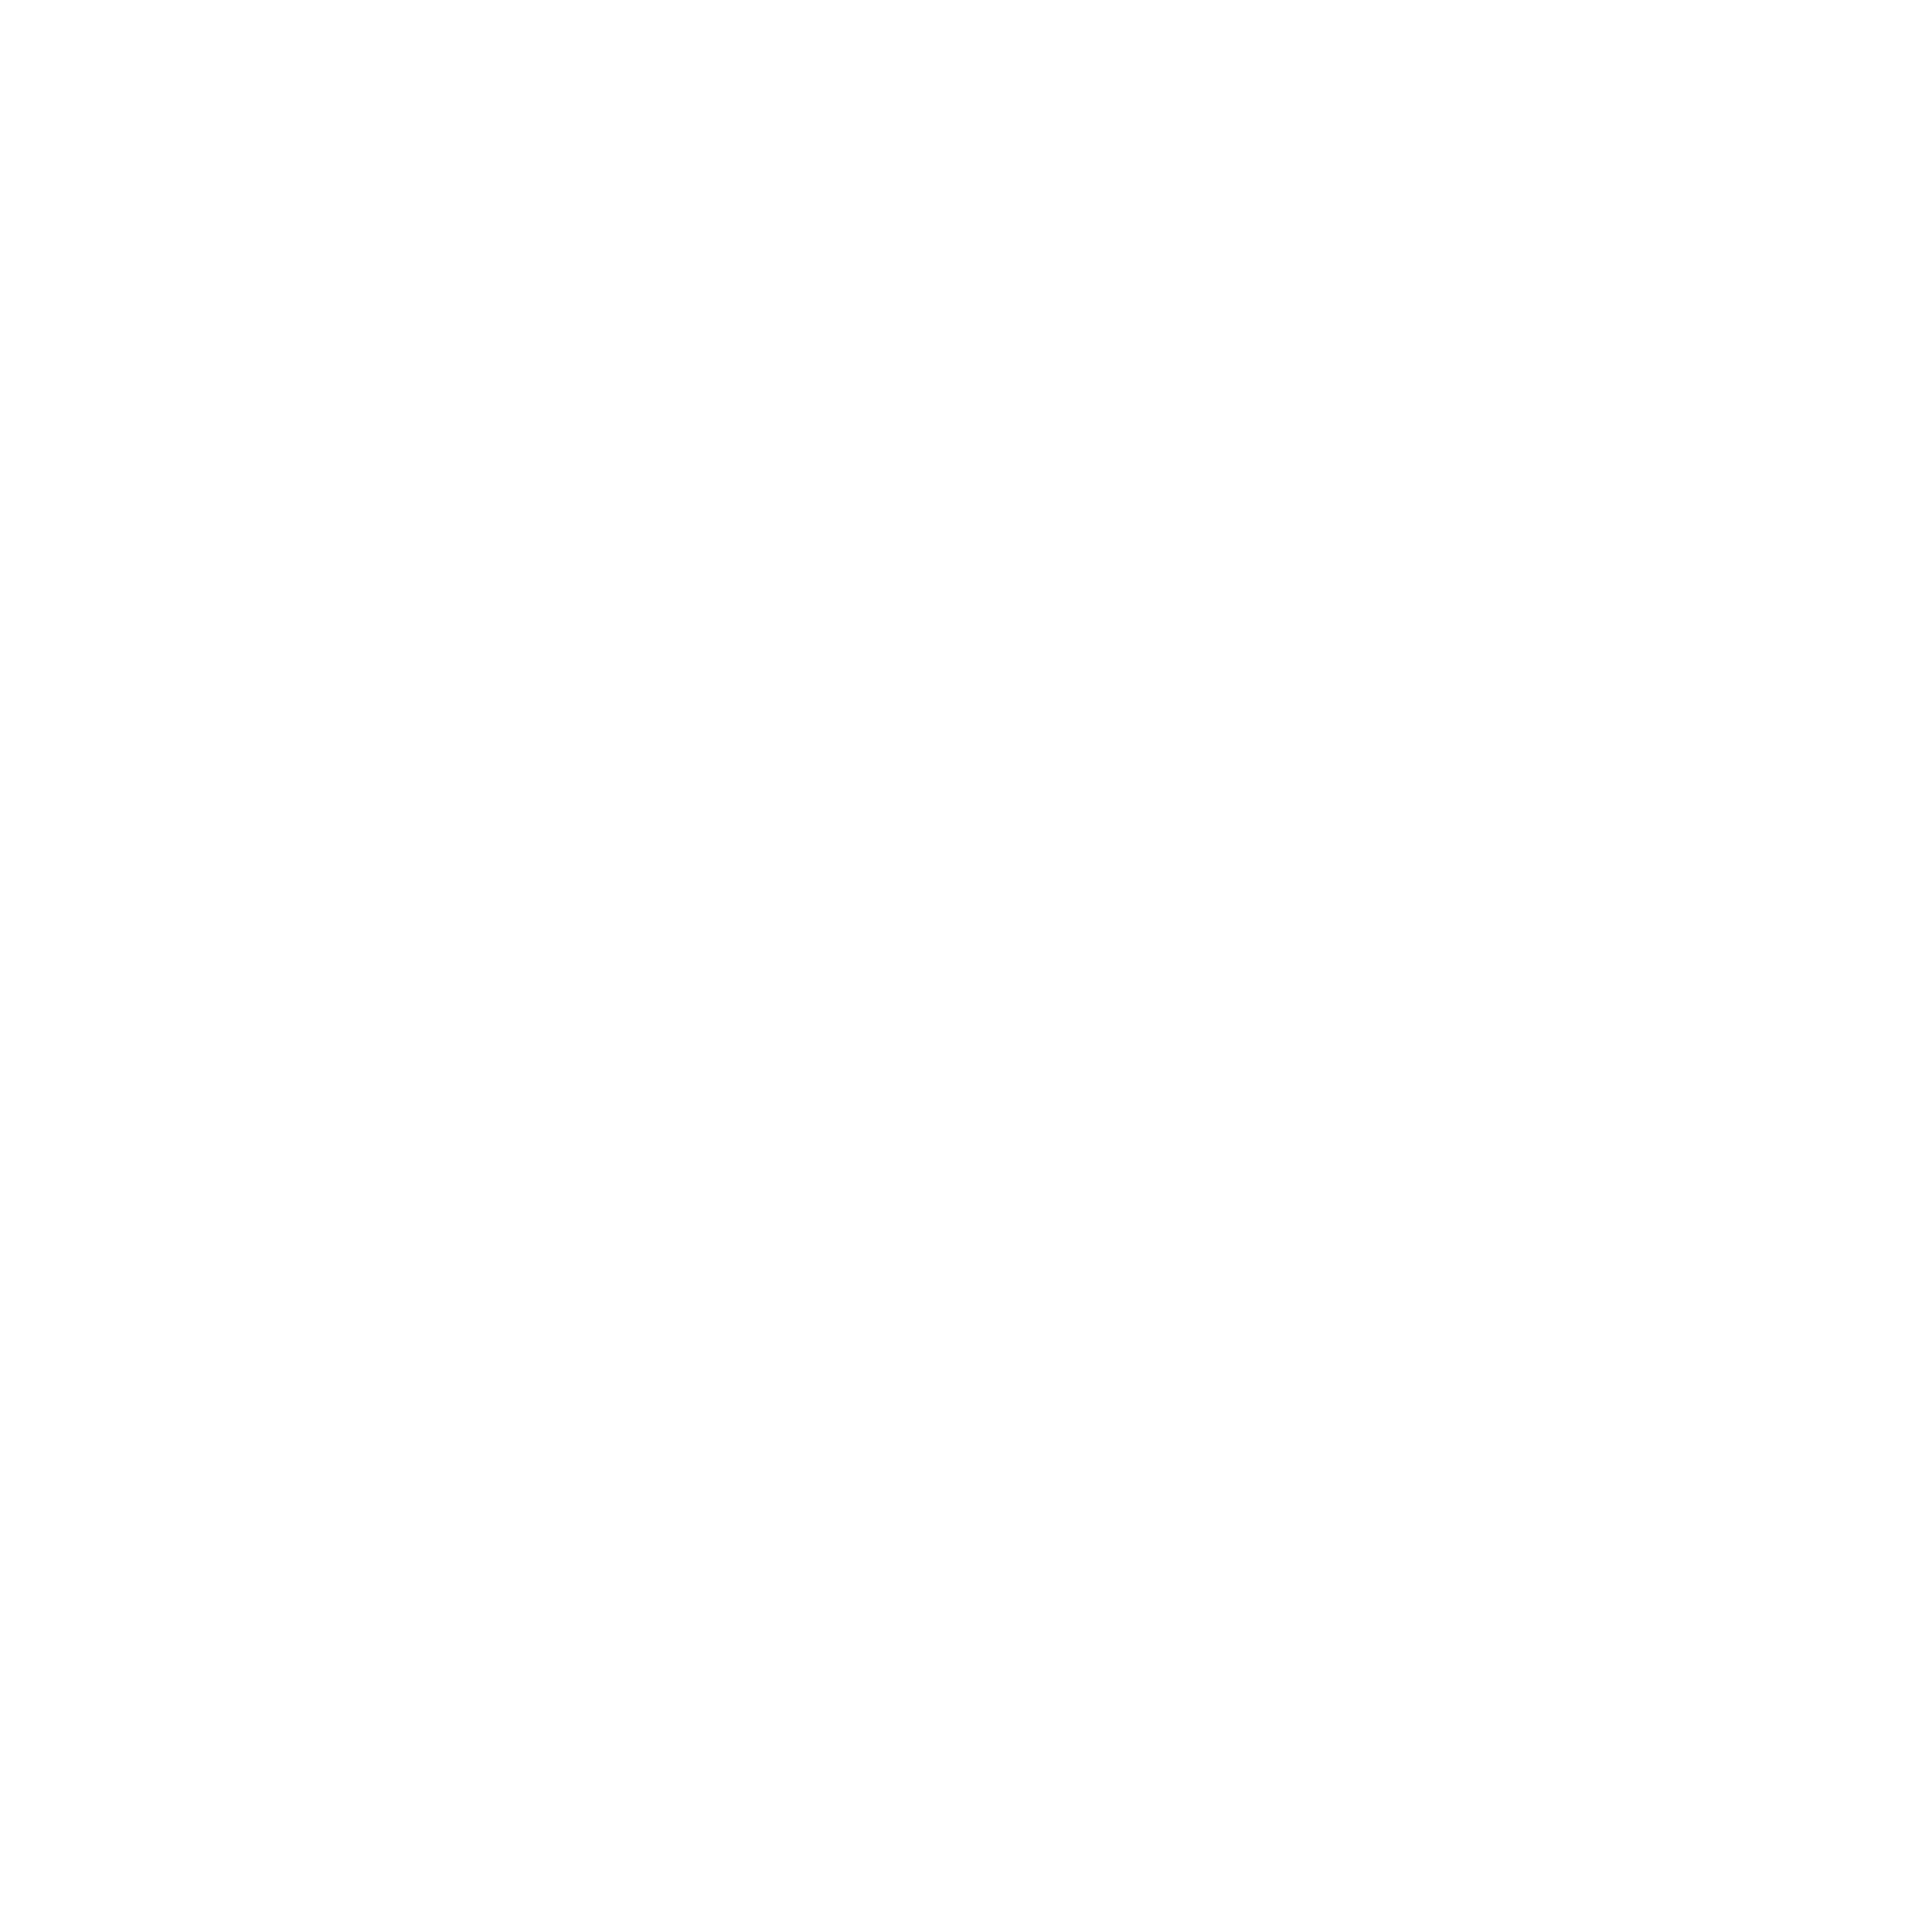 Logo_TheLondonTour_White_by_perfektany_com